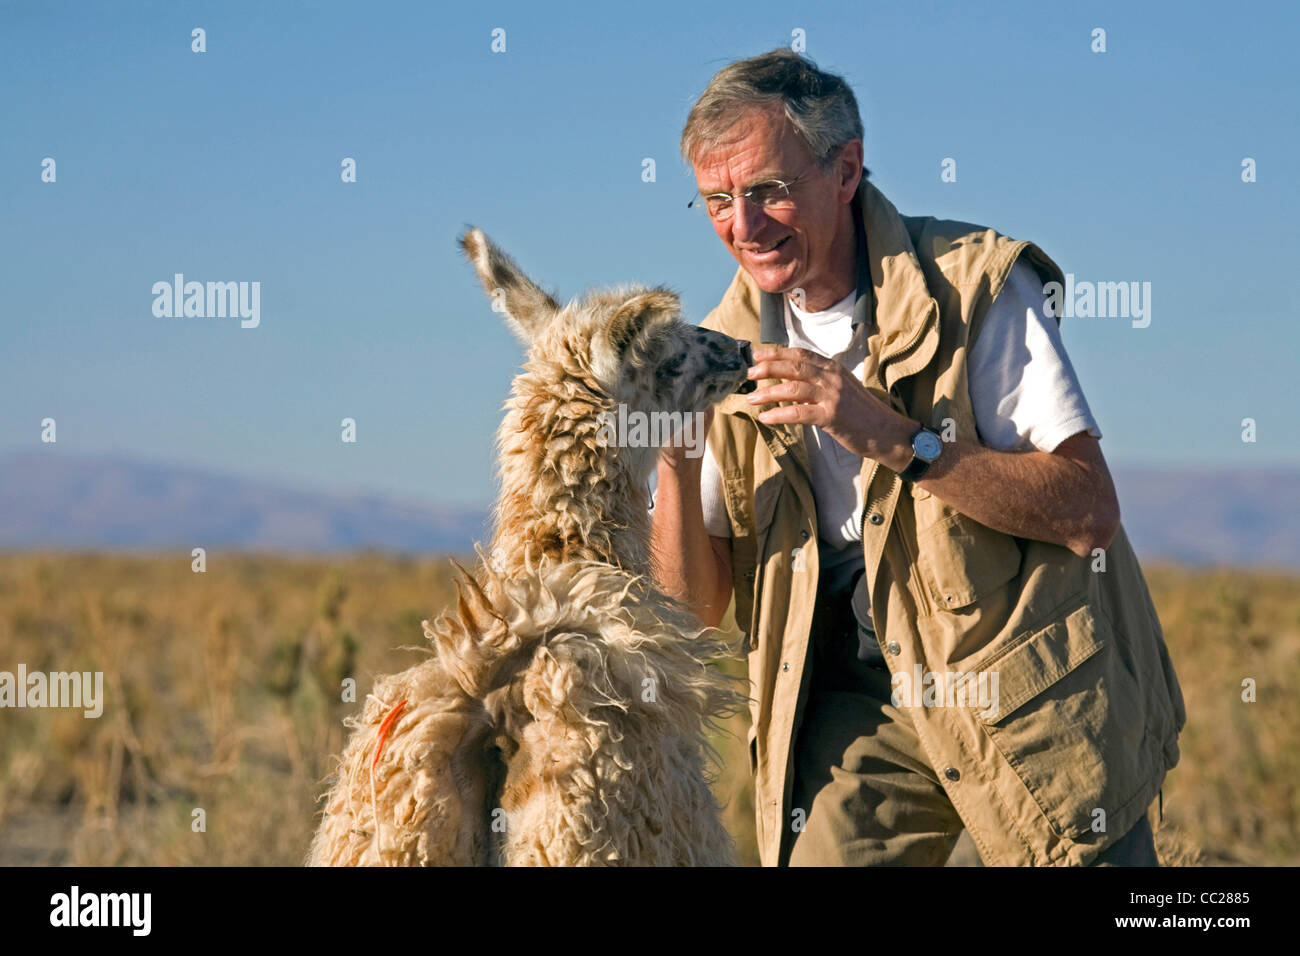 Llama (Lama glama) meets tourist on the isolated Altiplano in Argentina - Stock Image